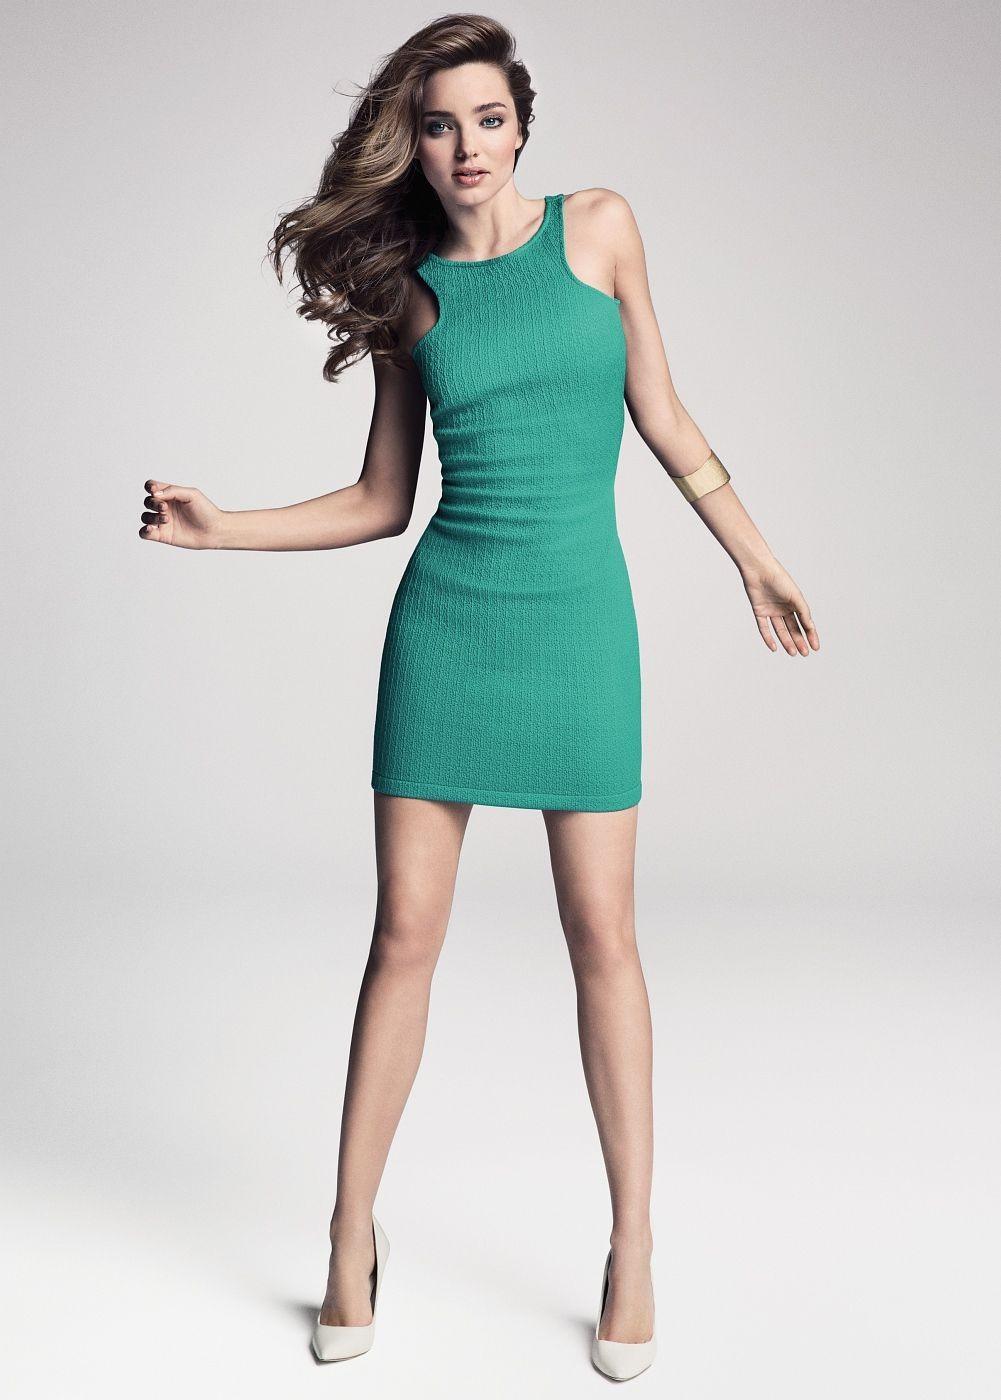 Miranda Kerr – Mango Summer 2013 Photoshoot